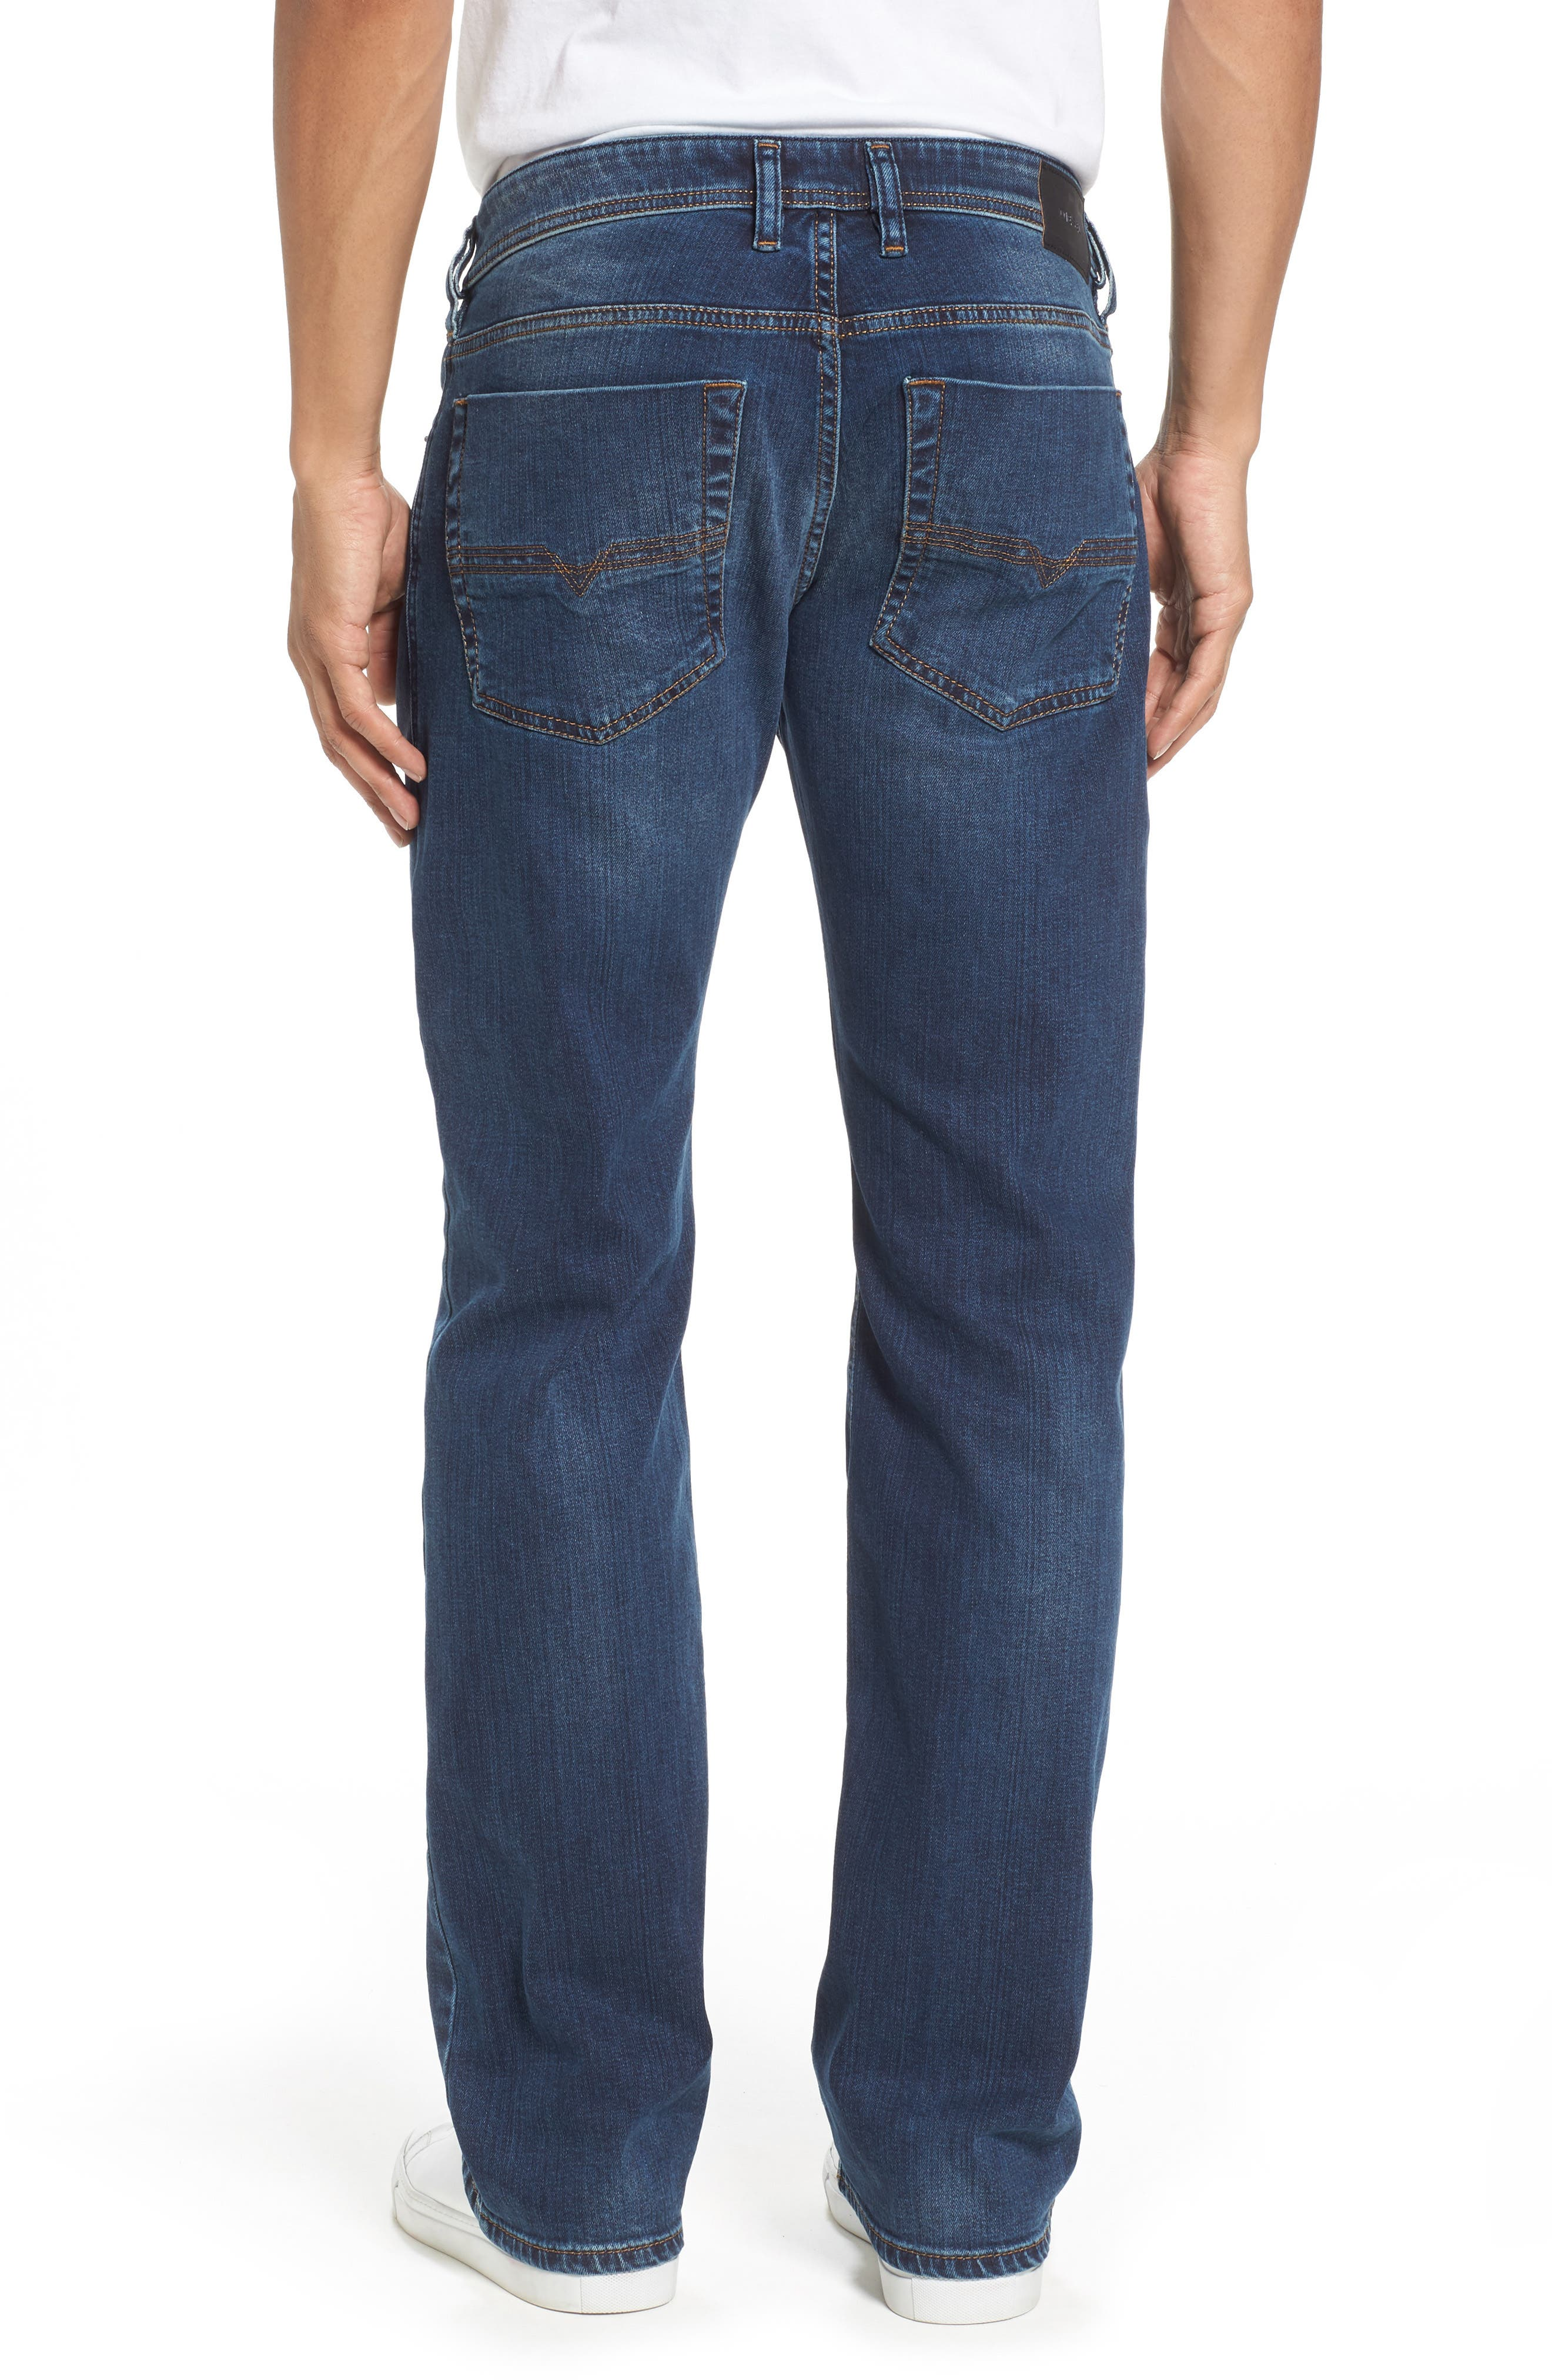 Zatiny Bootcut Jeans,                             Alternate thumbnail 2, color,                             084BU